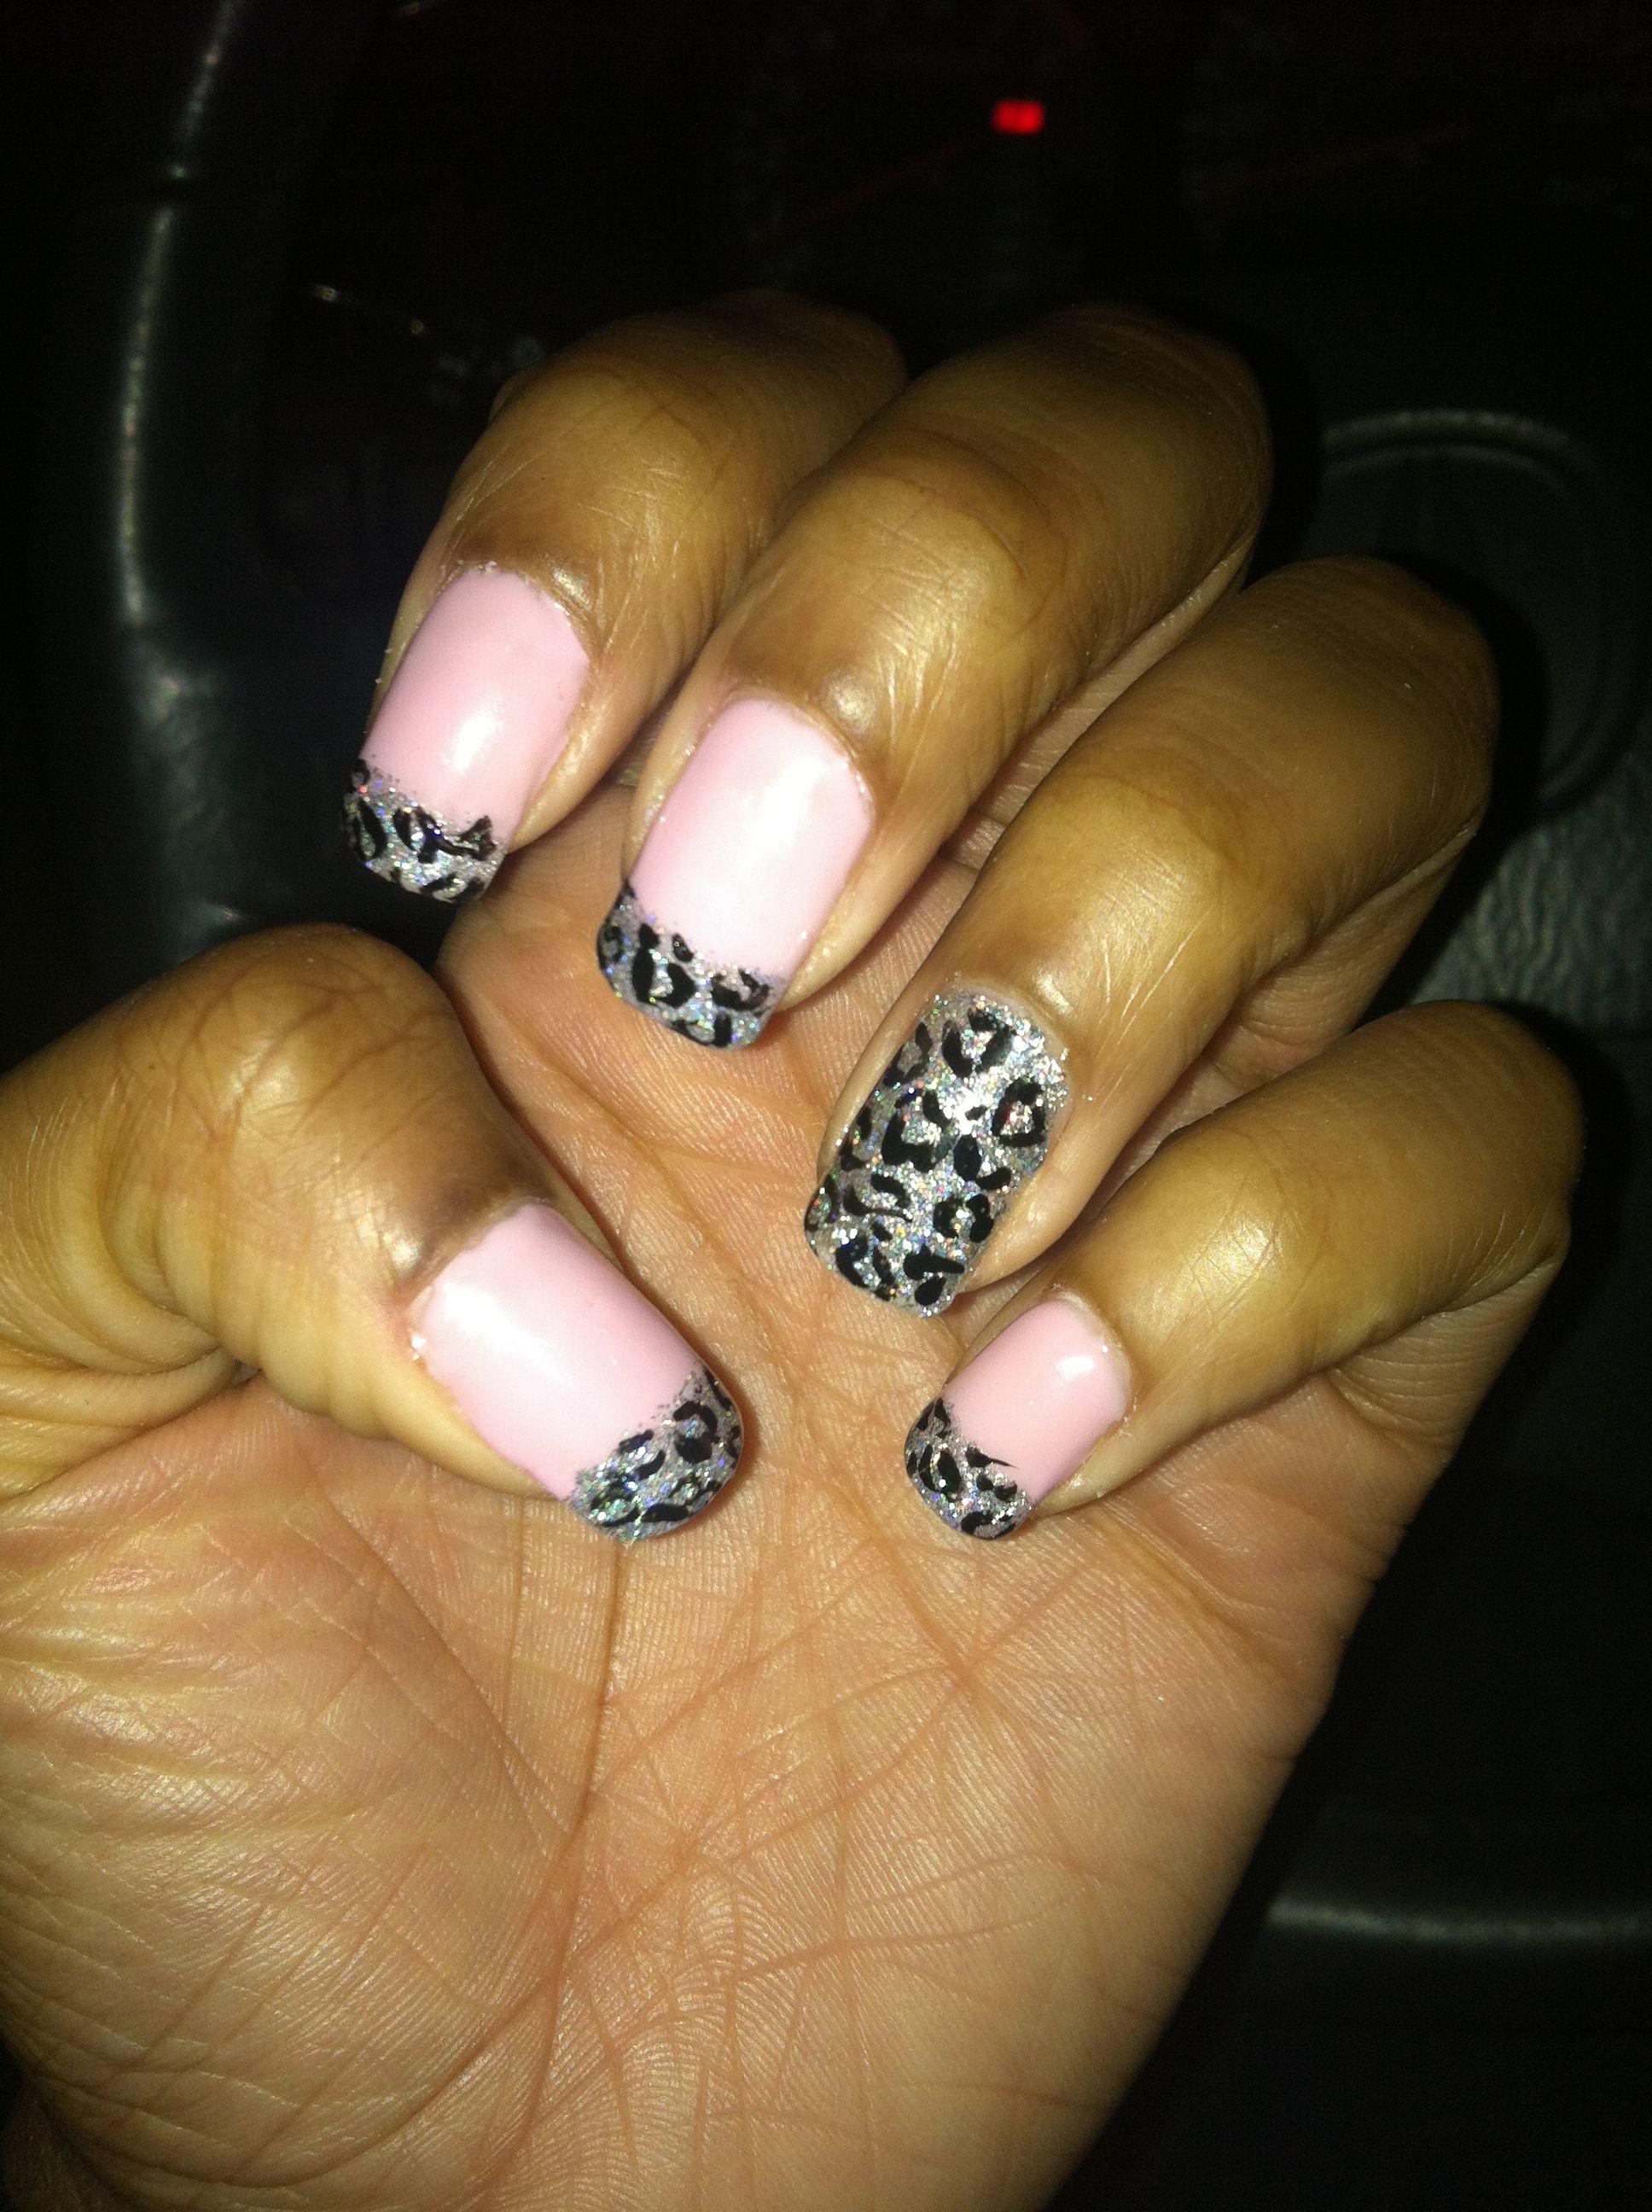 My fav nails